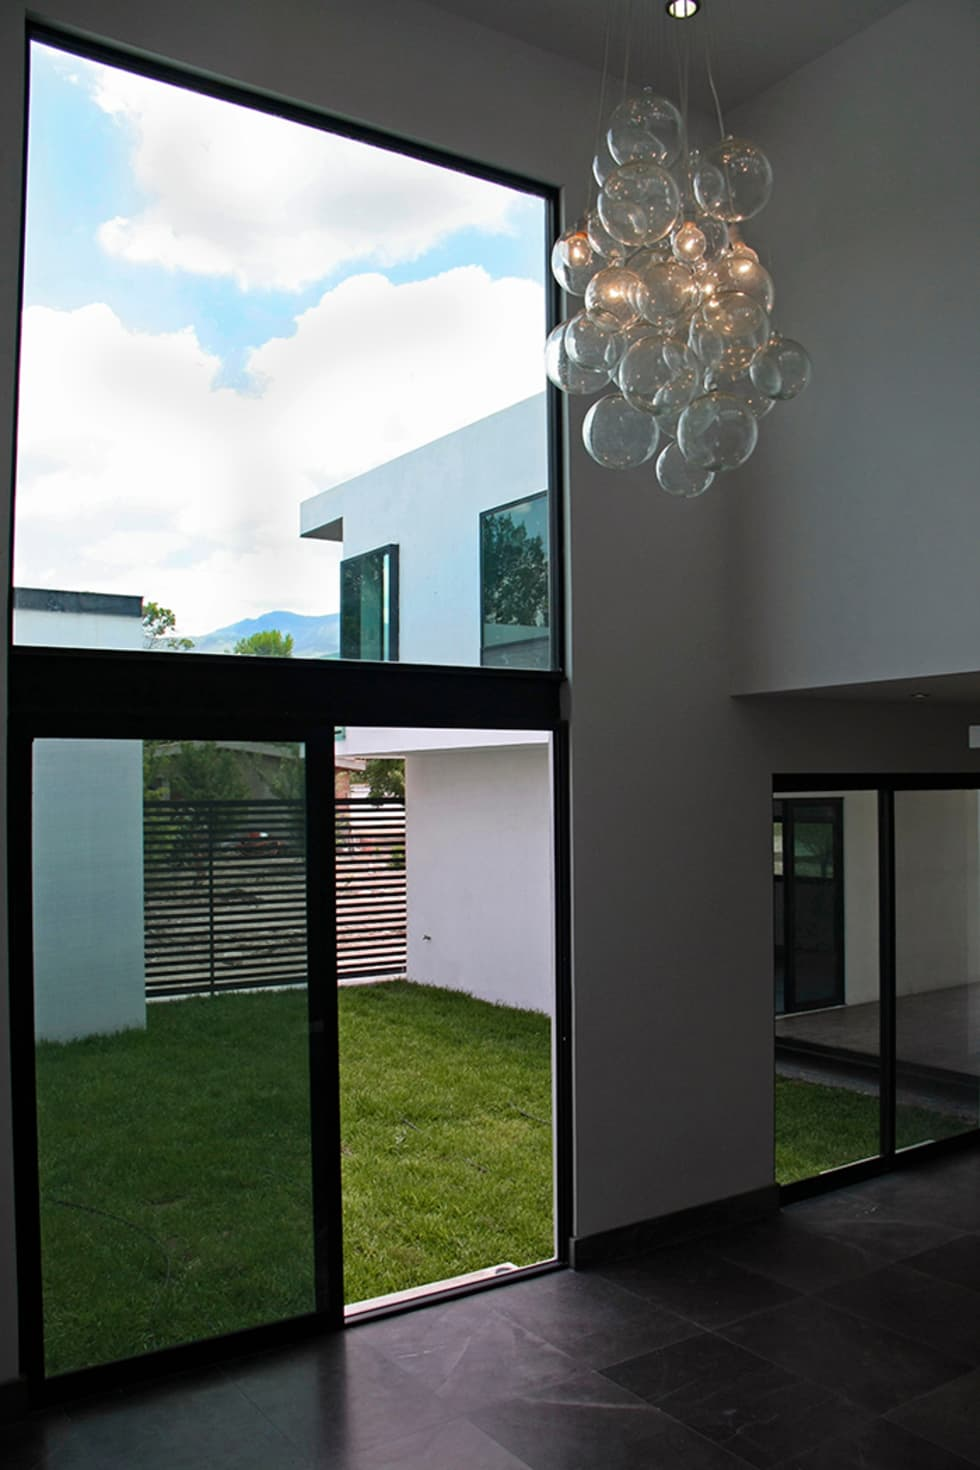 Vista desde sala hacia jardín central: Salas de estilo moderno por Narda Davila arquitectura